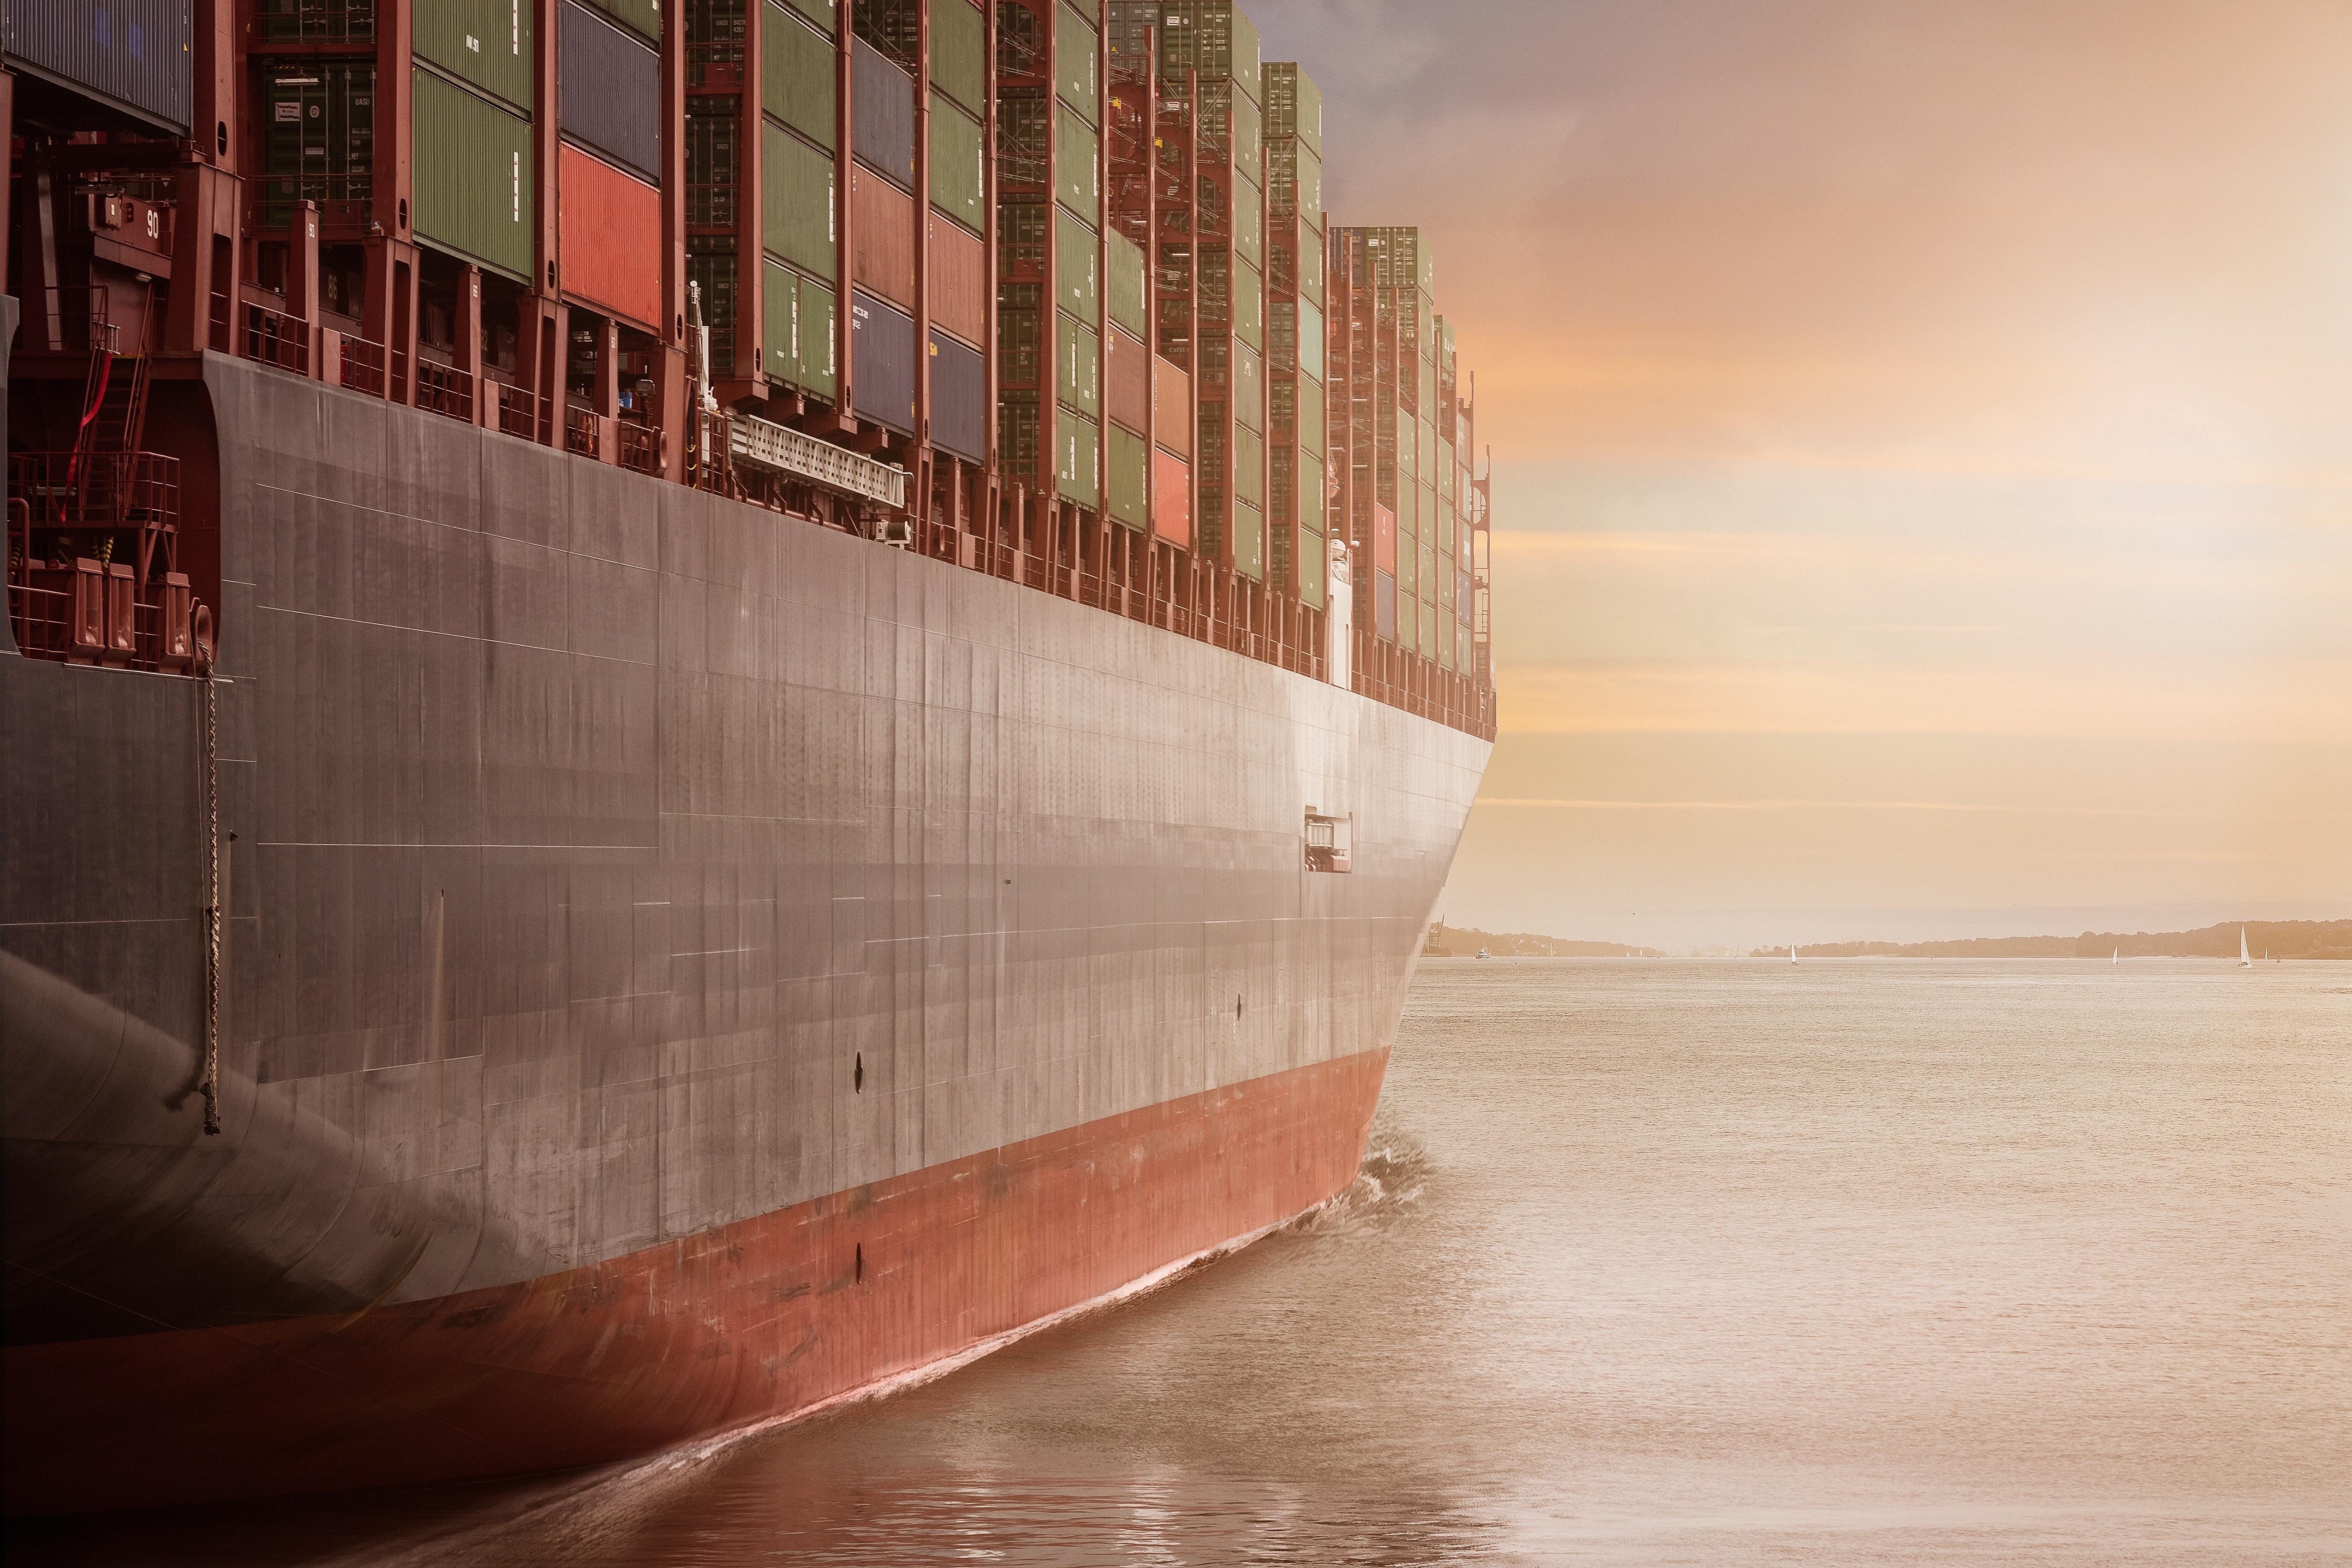 Chambers Shipping Guide 2019